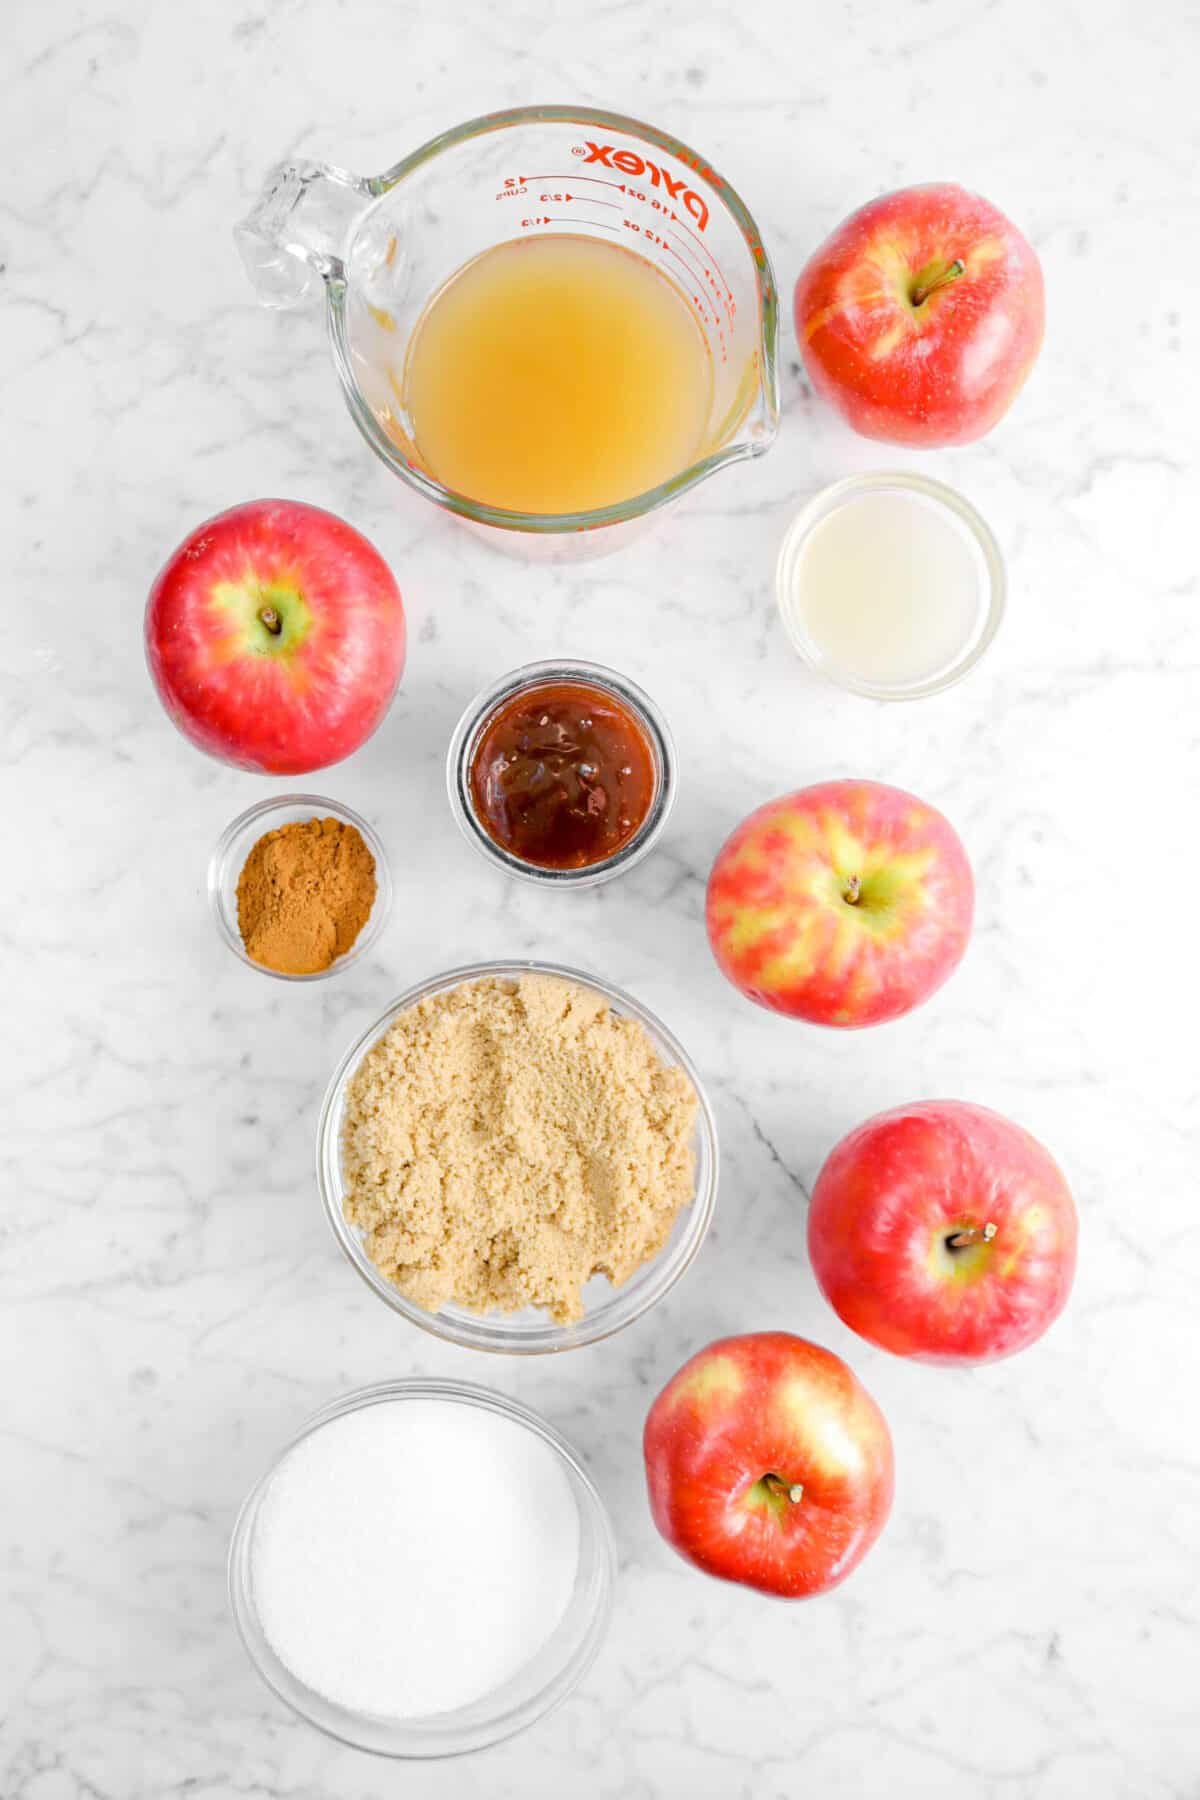 apple cider, apples, lemon juice, boiled cider, apple pie spice, brown sugar, and sugar on a marble counter